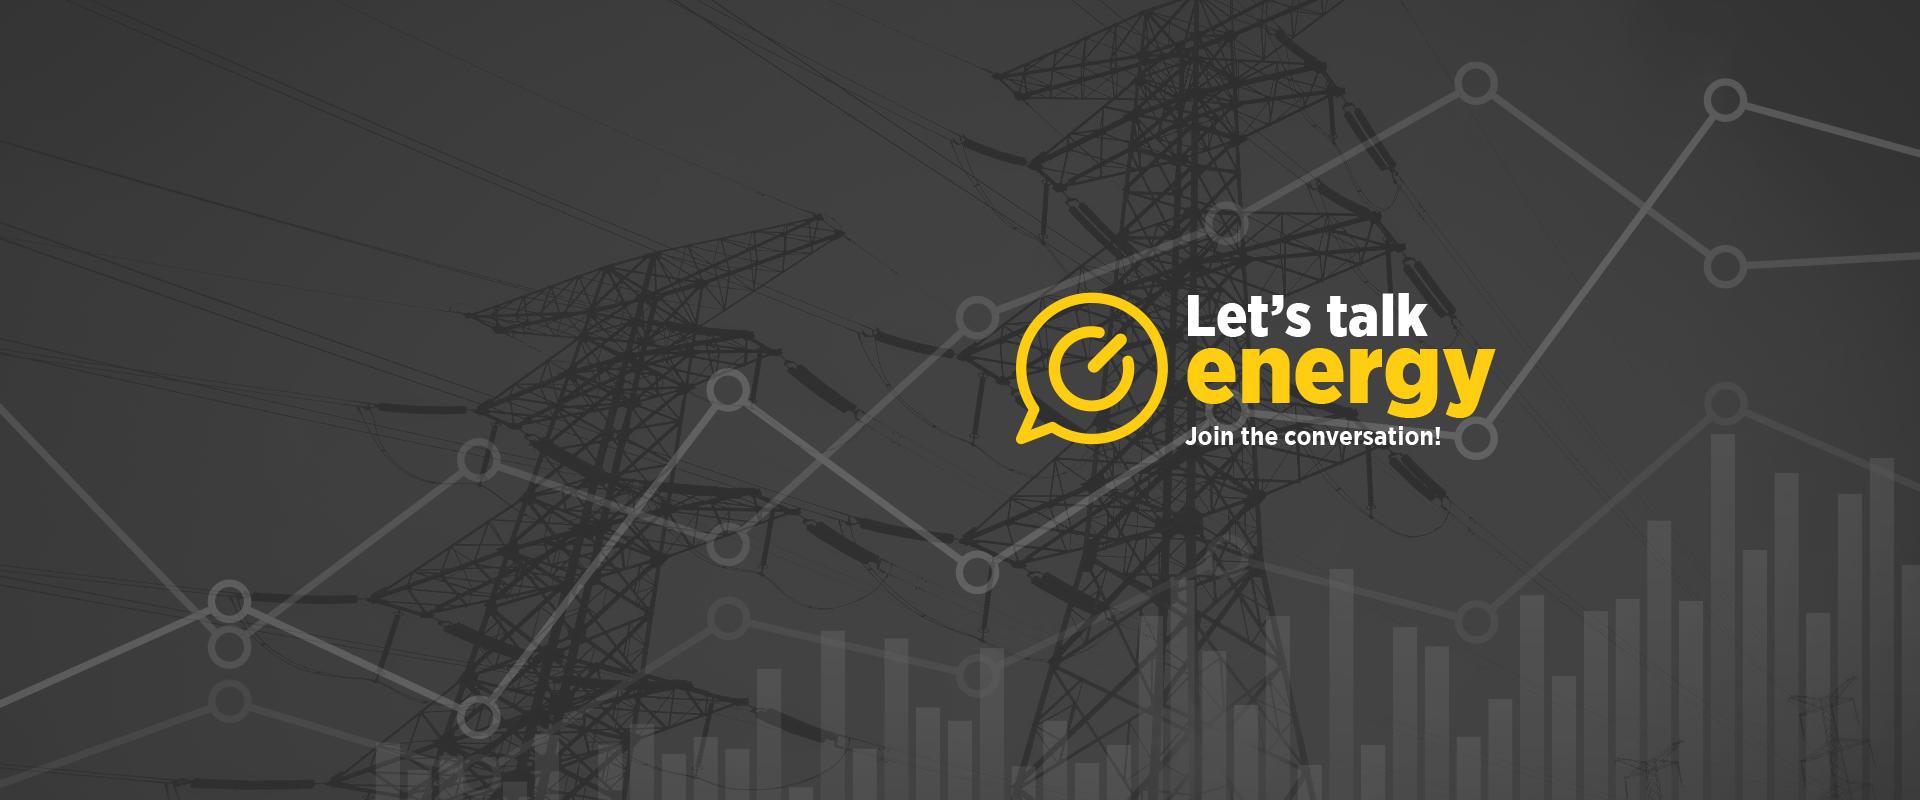 Let's Talk Energy